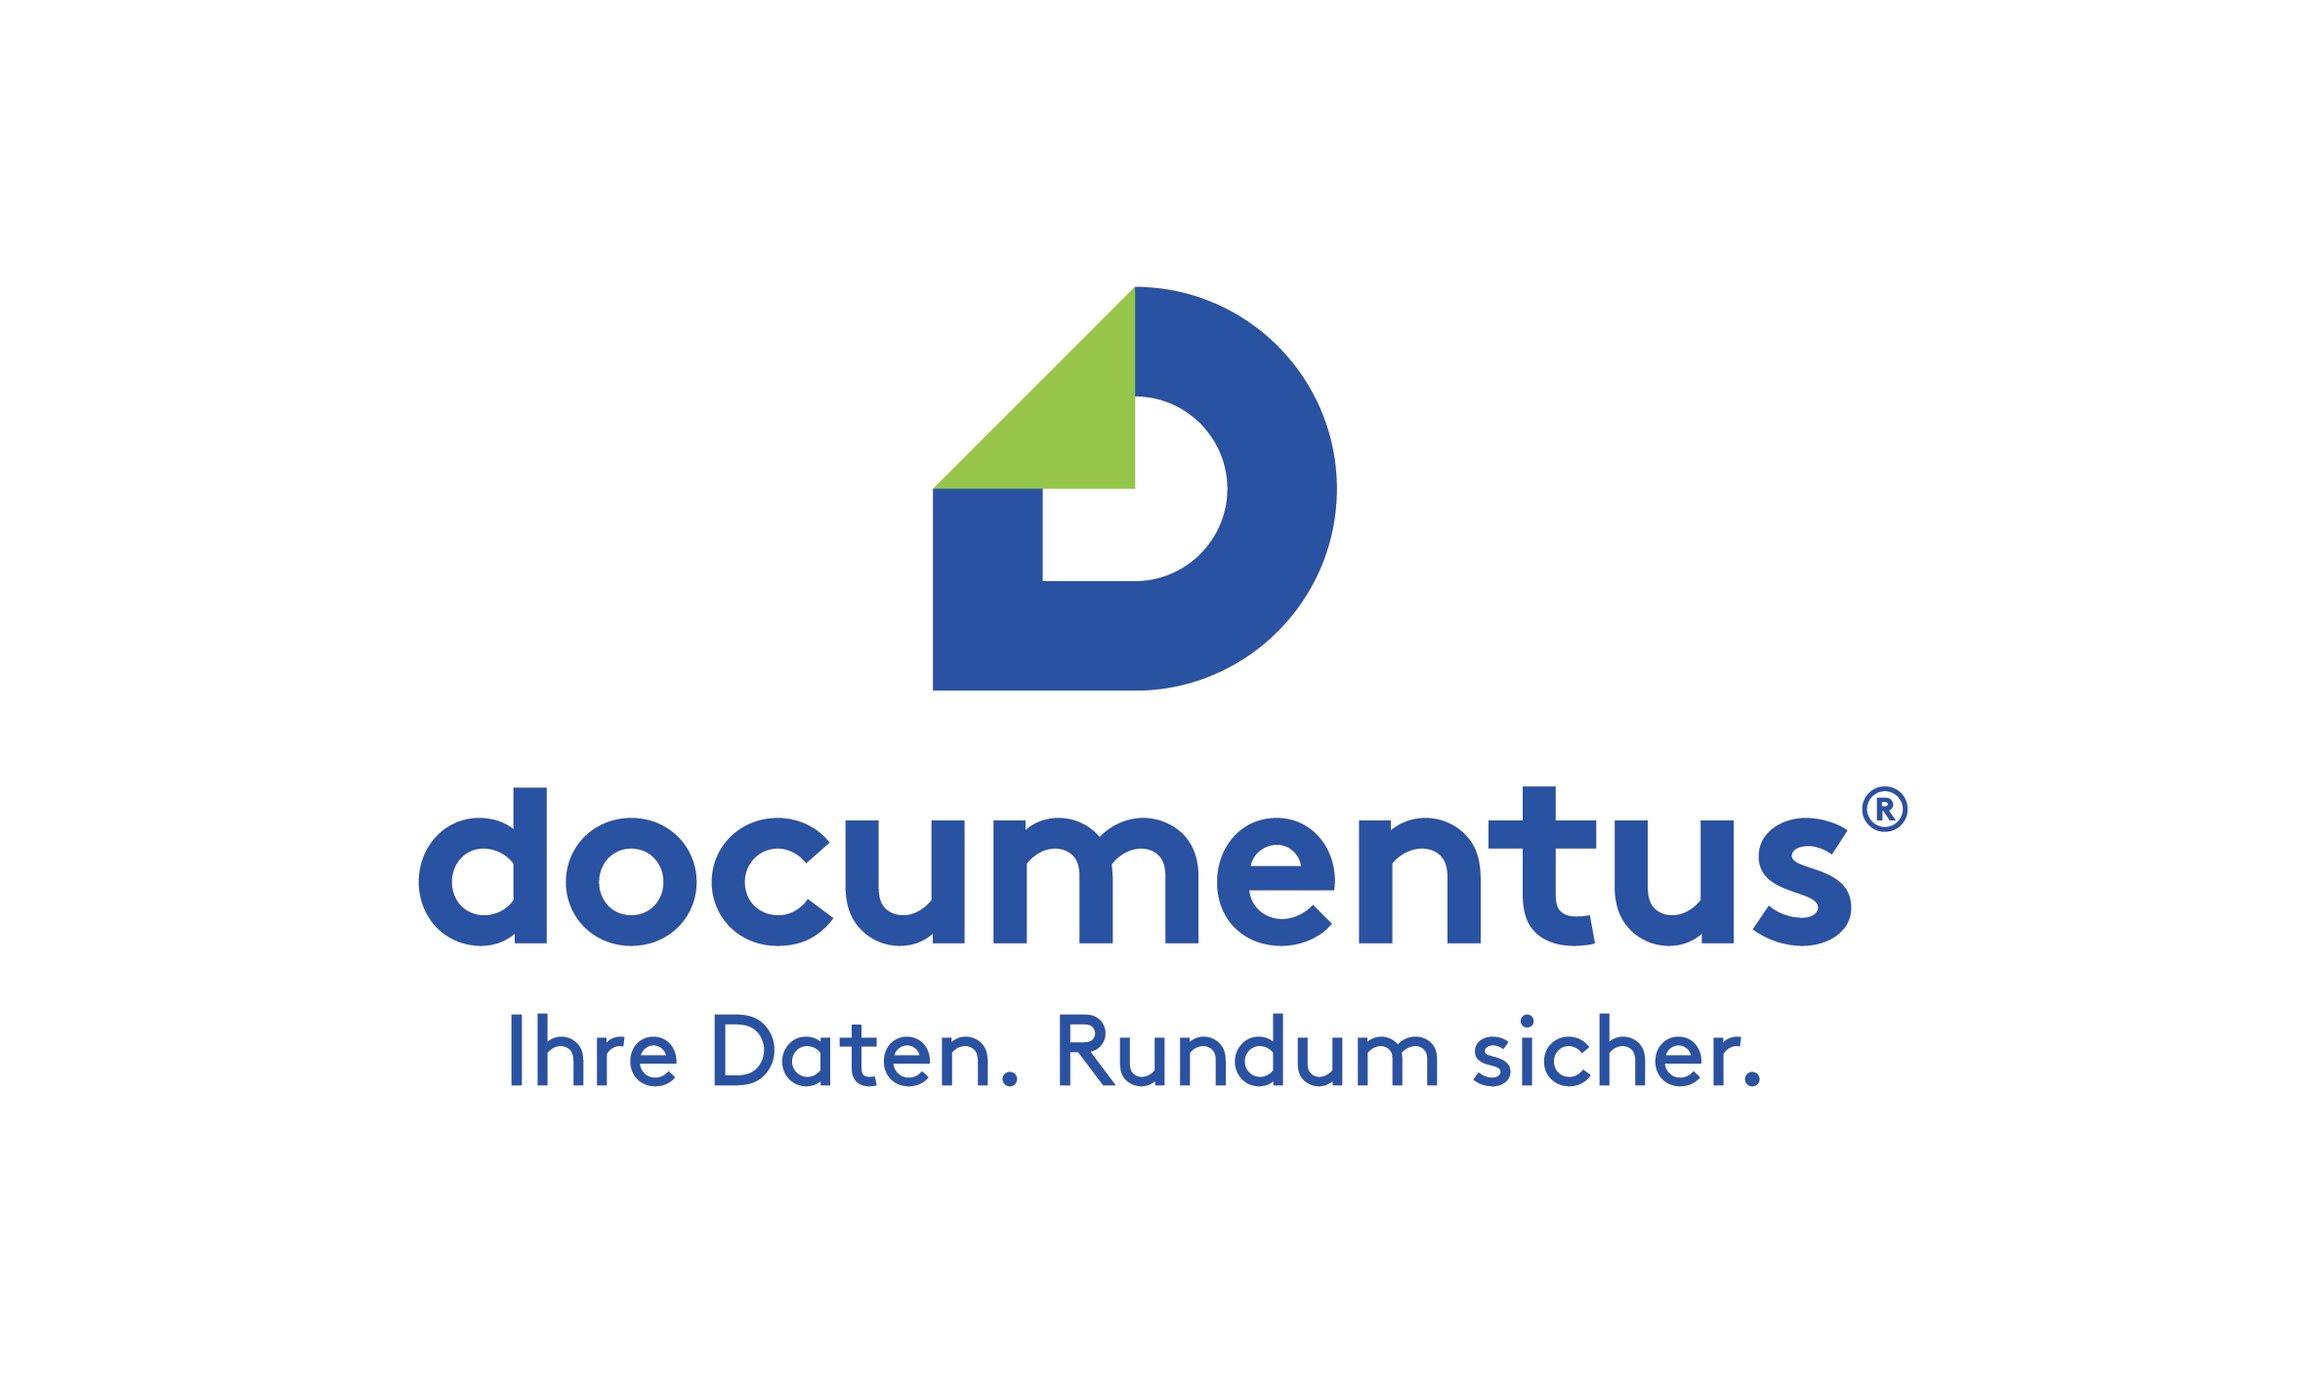 documentus_Wort-Bildmarke + Claim_original_CMYK